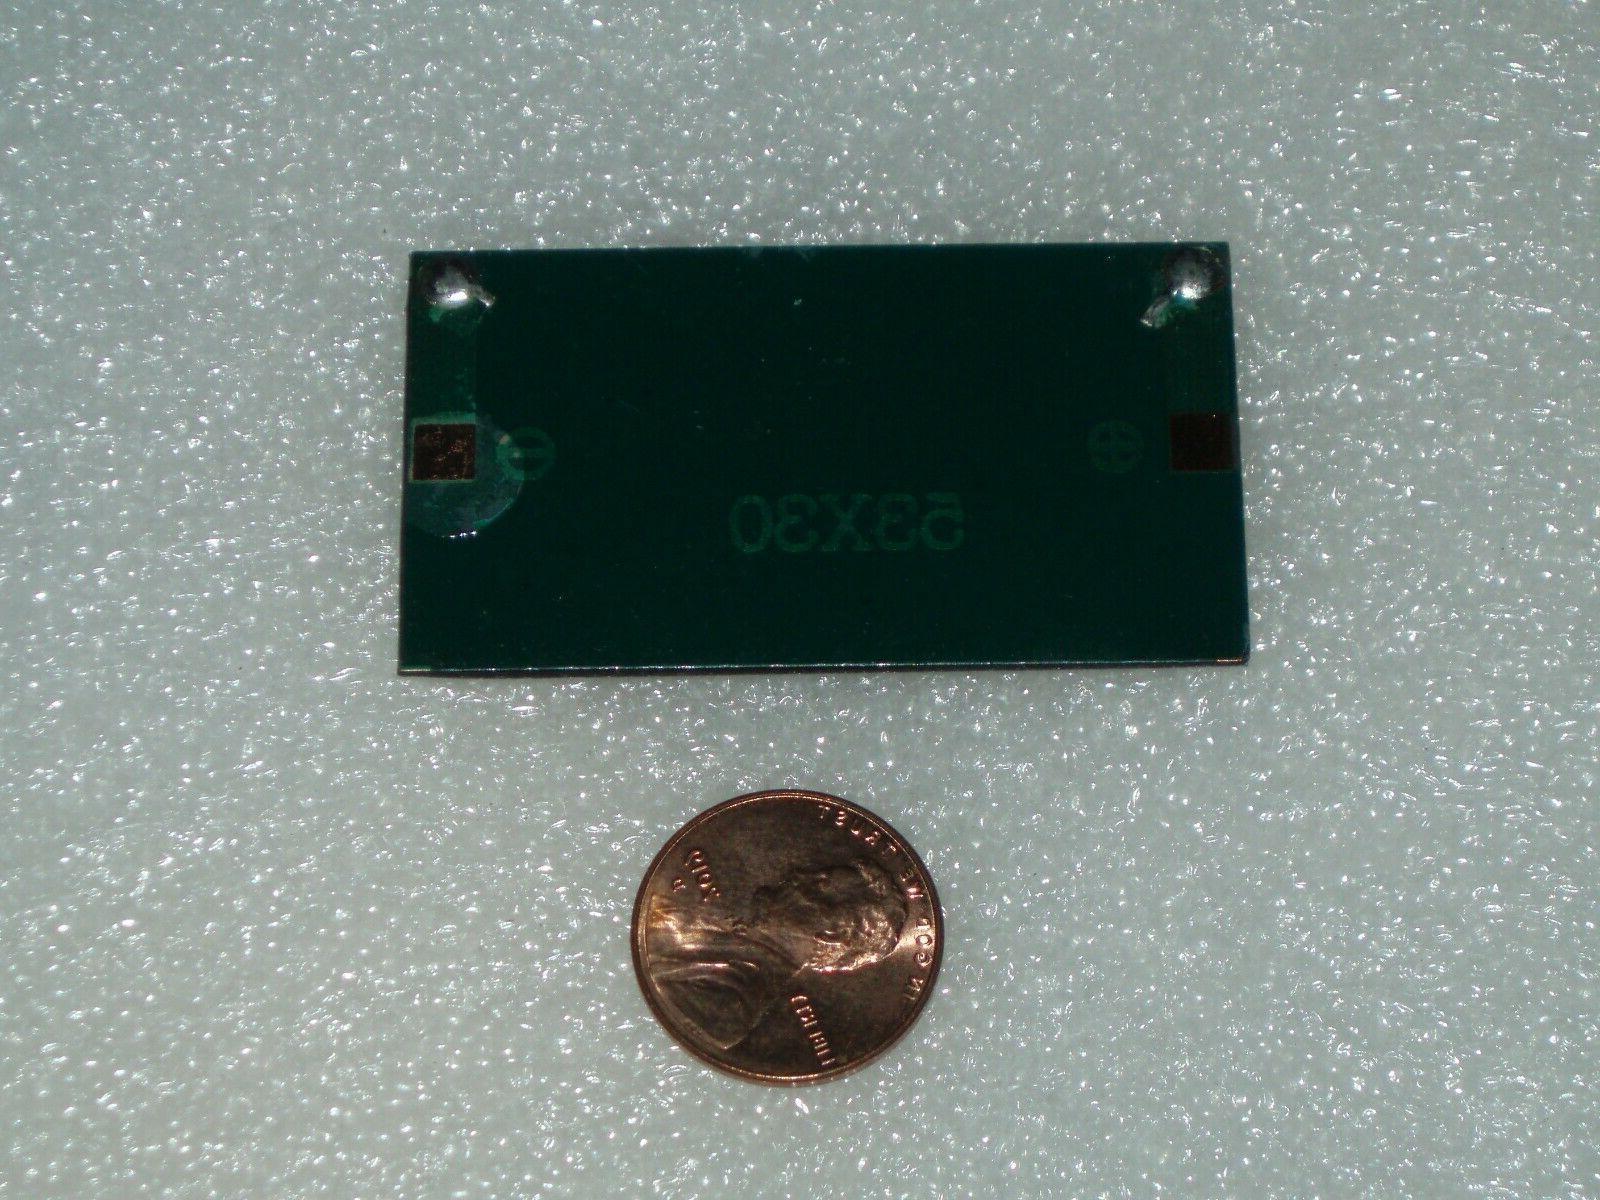 5V 30mA size 53mm x solar panel